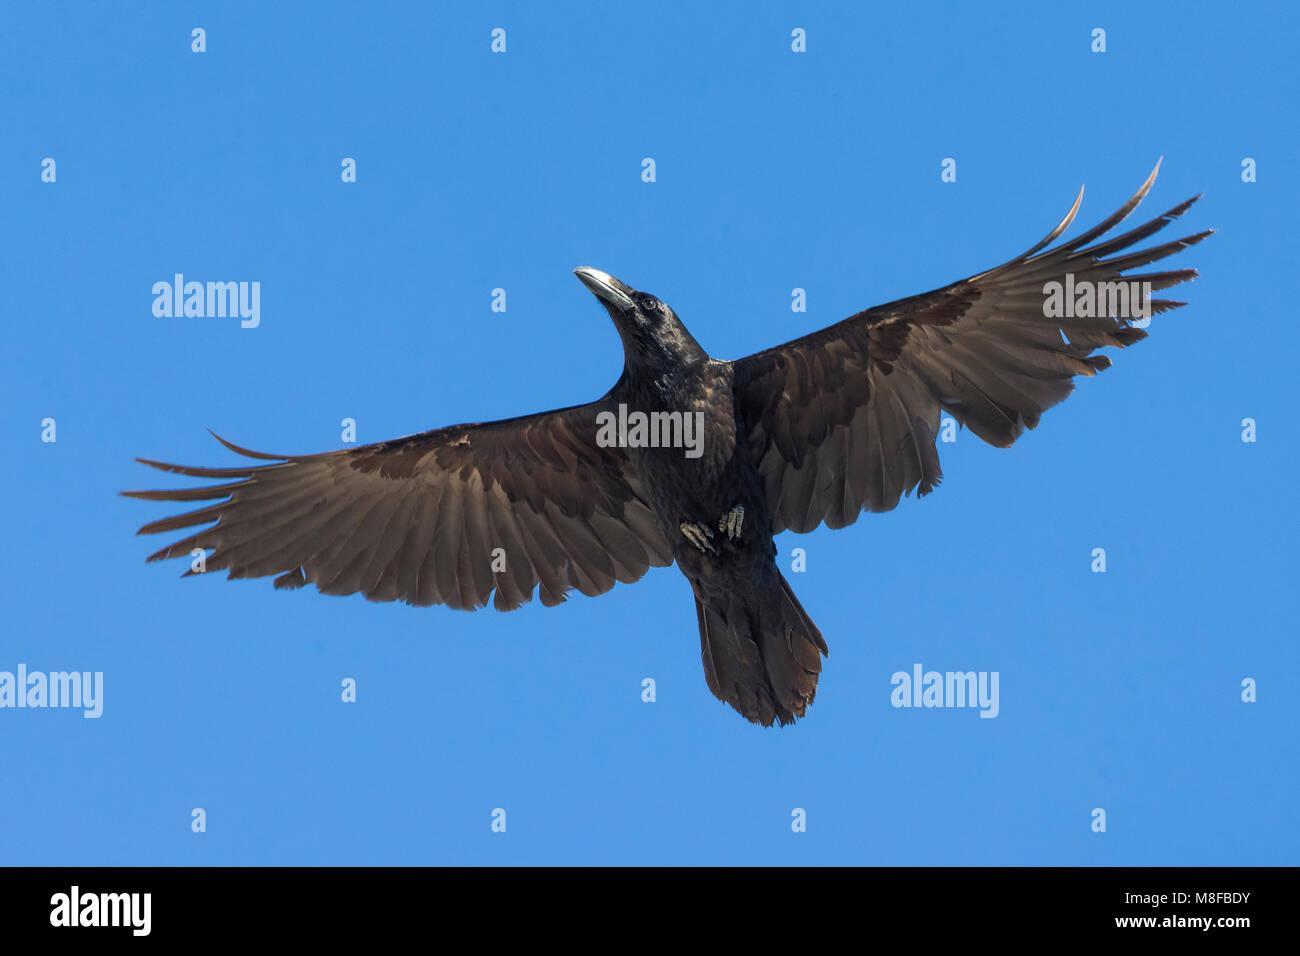 Raaf; Raven; Corvus corax - Stock Image